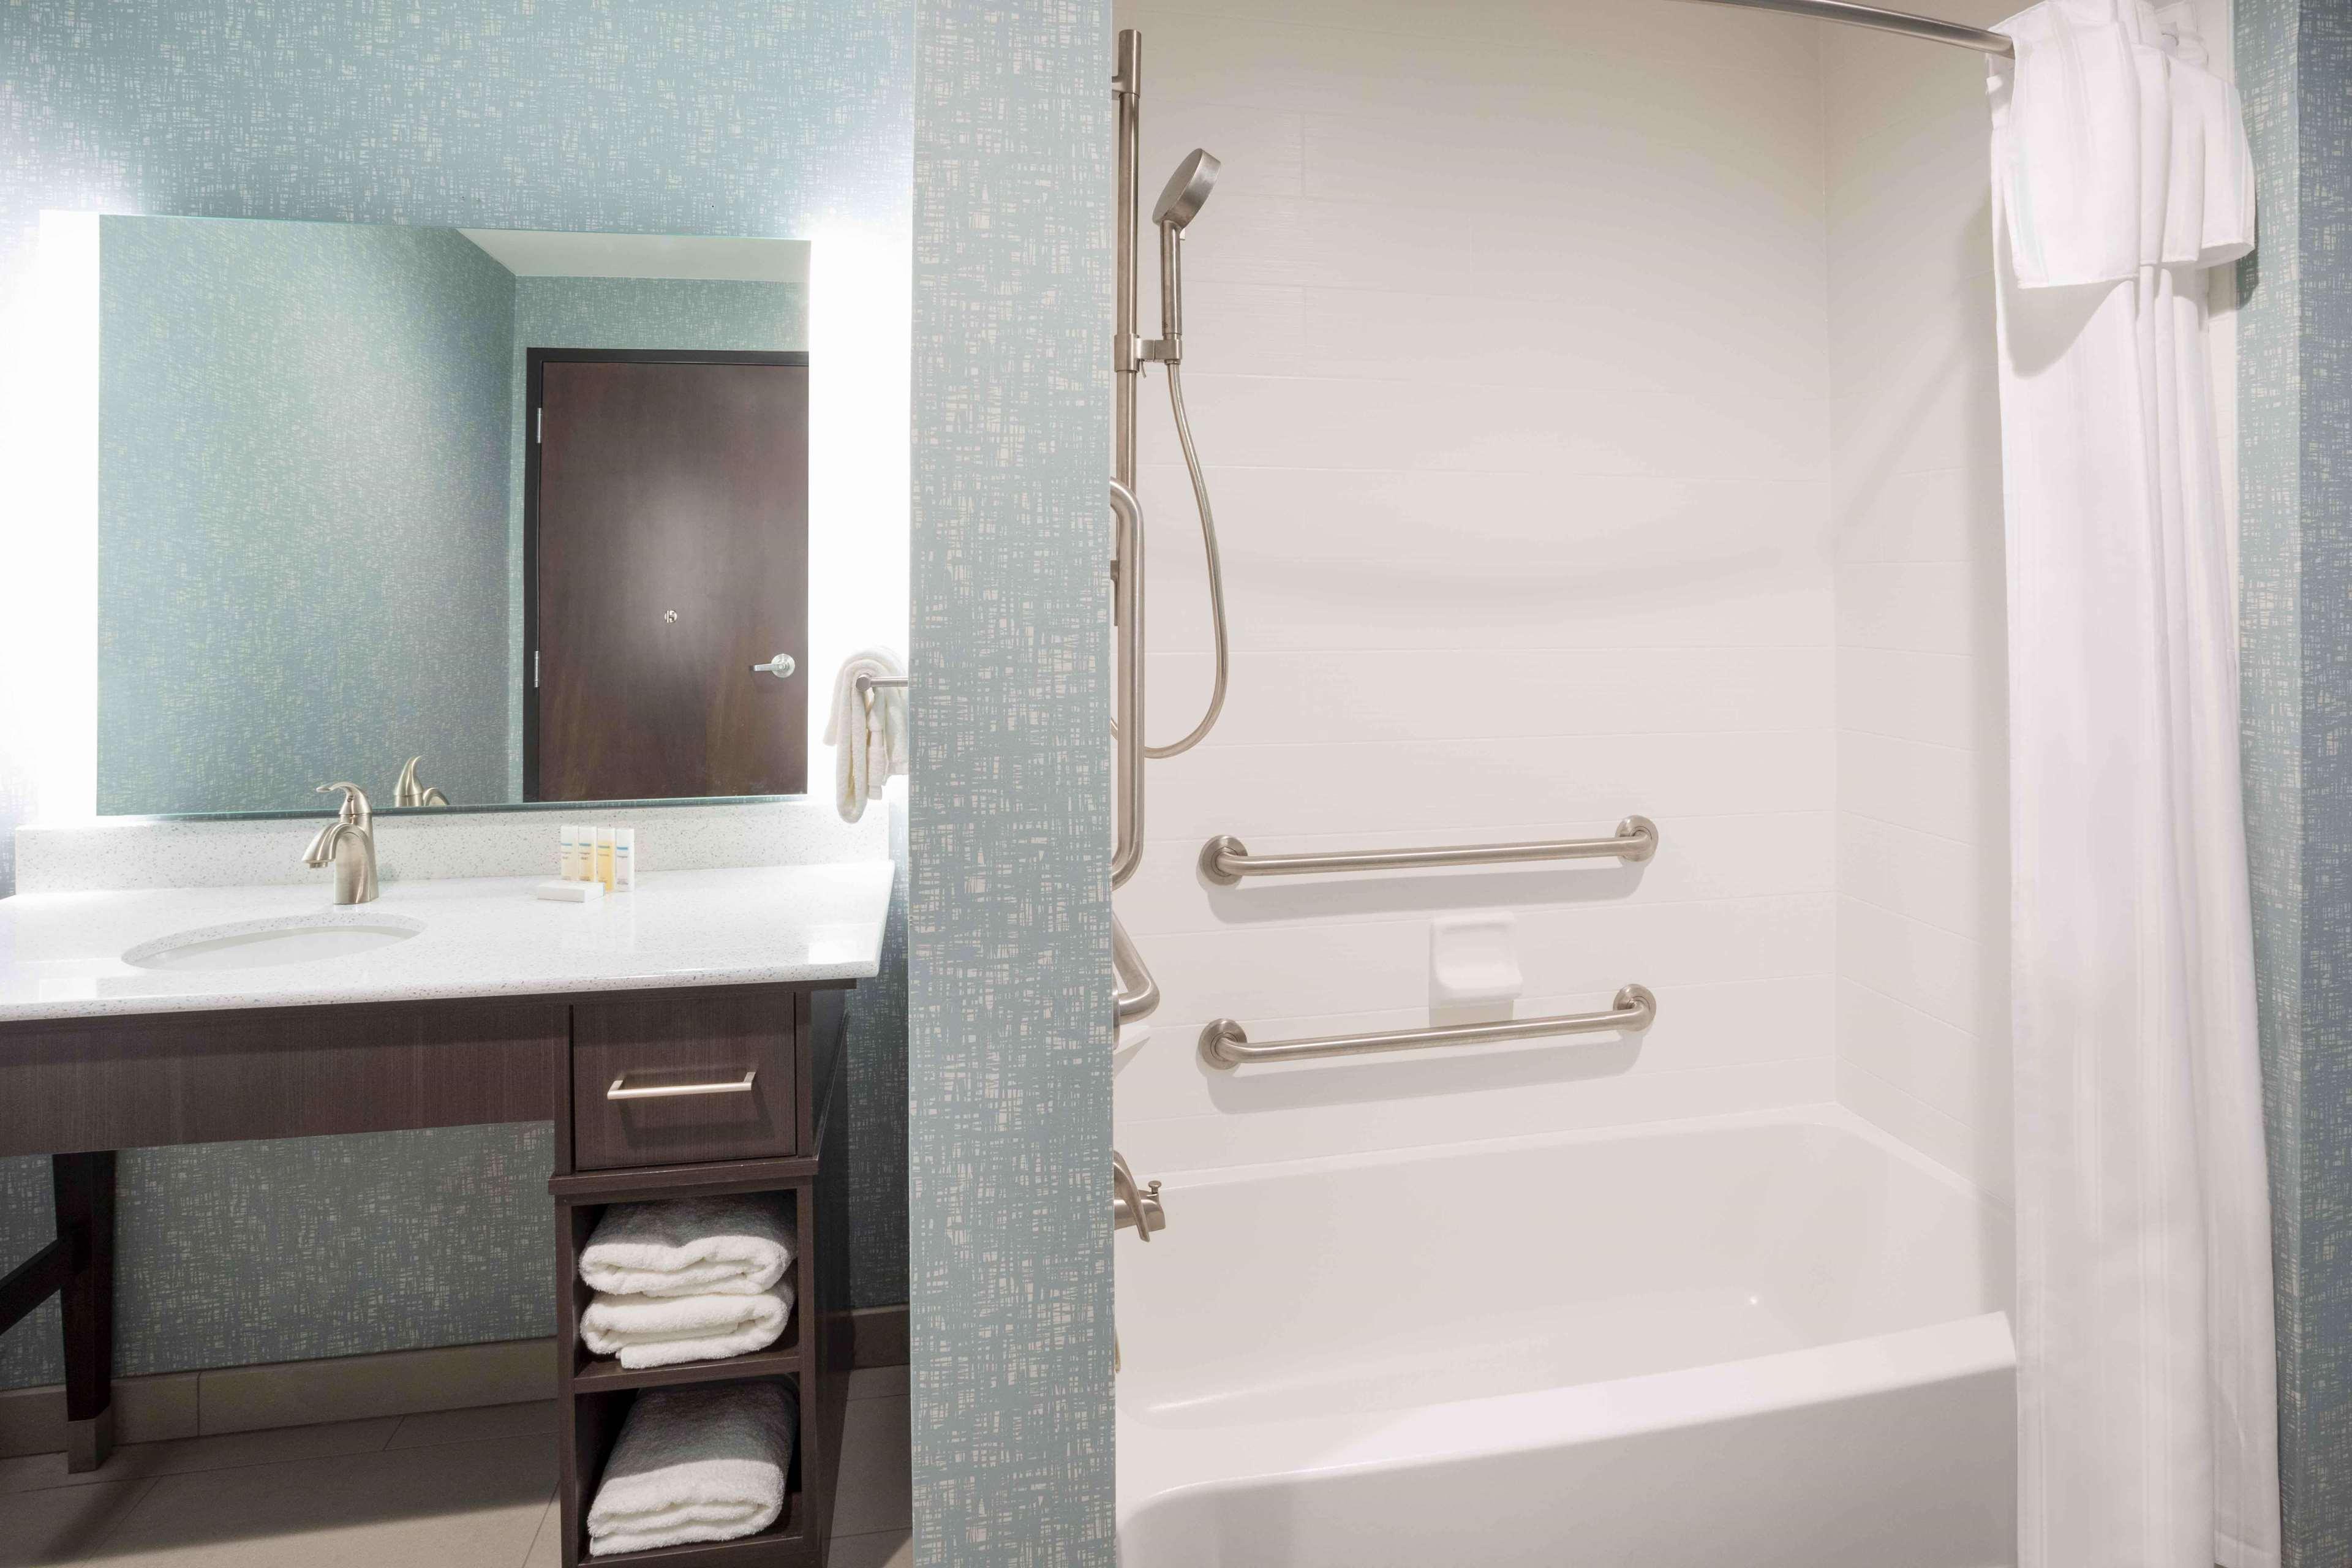 Homewood Suites by Hilton Edina Minneapolis image 22